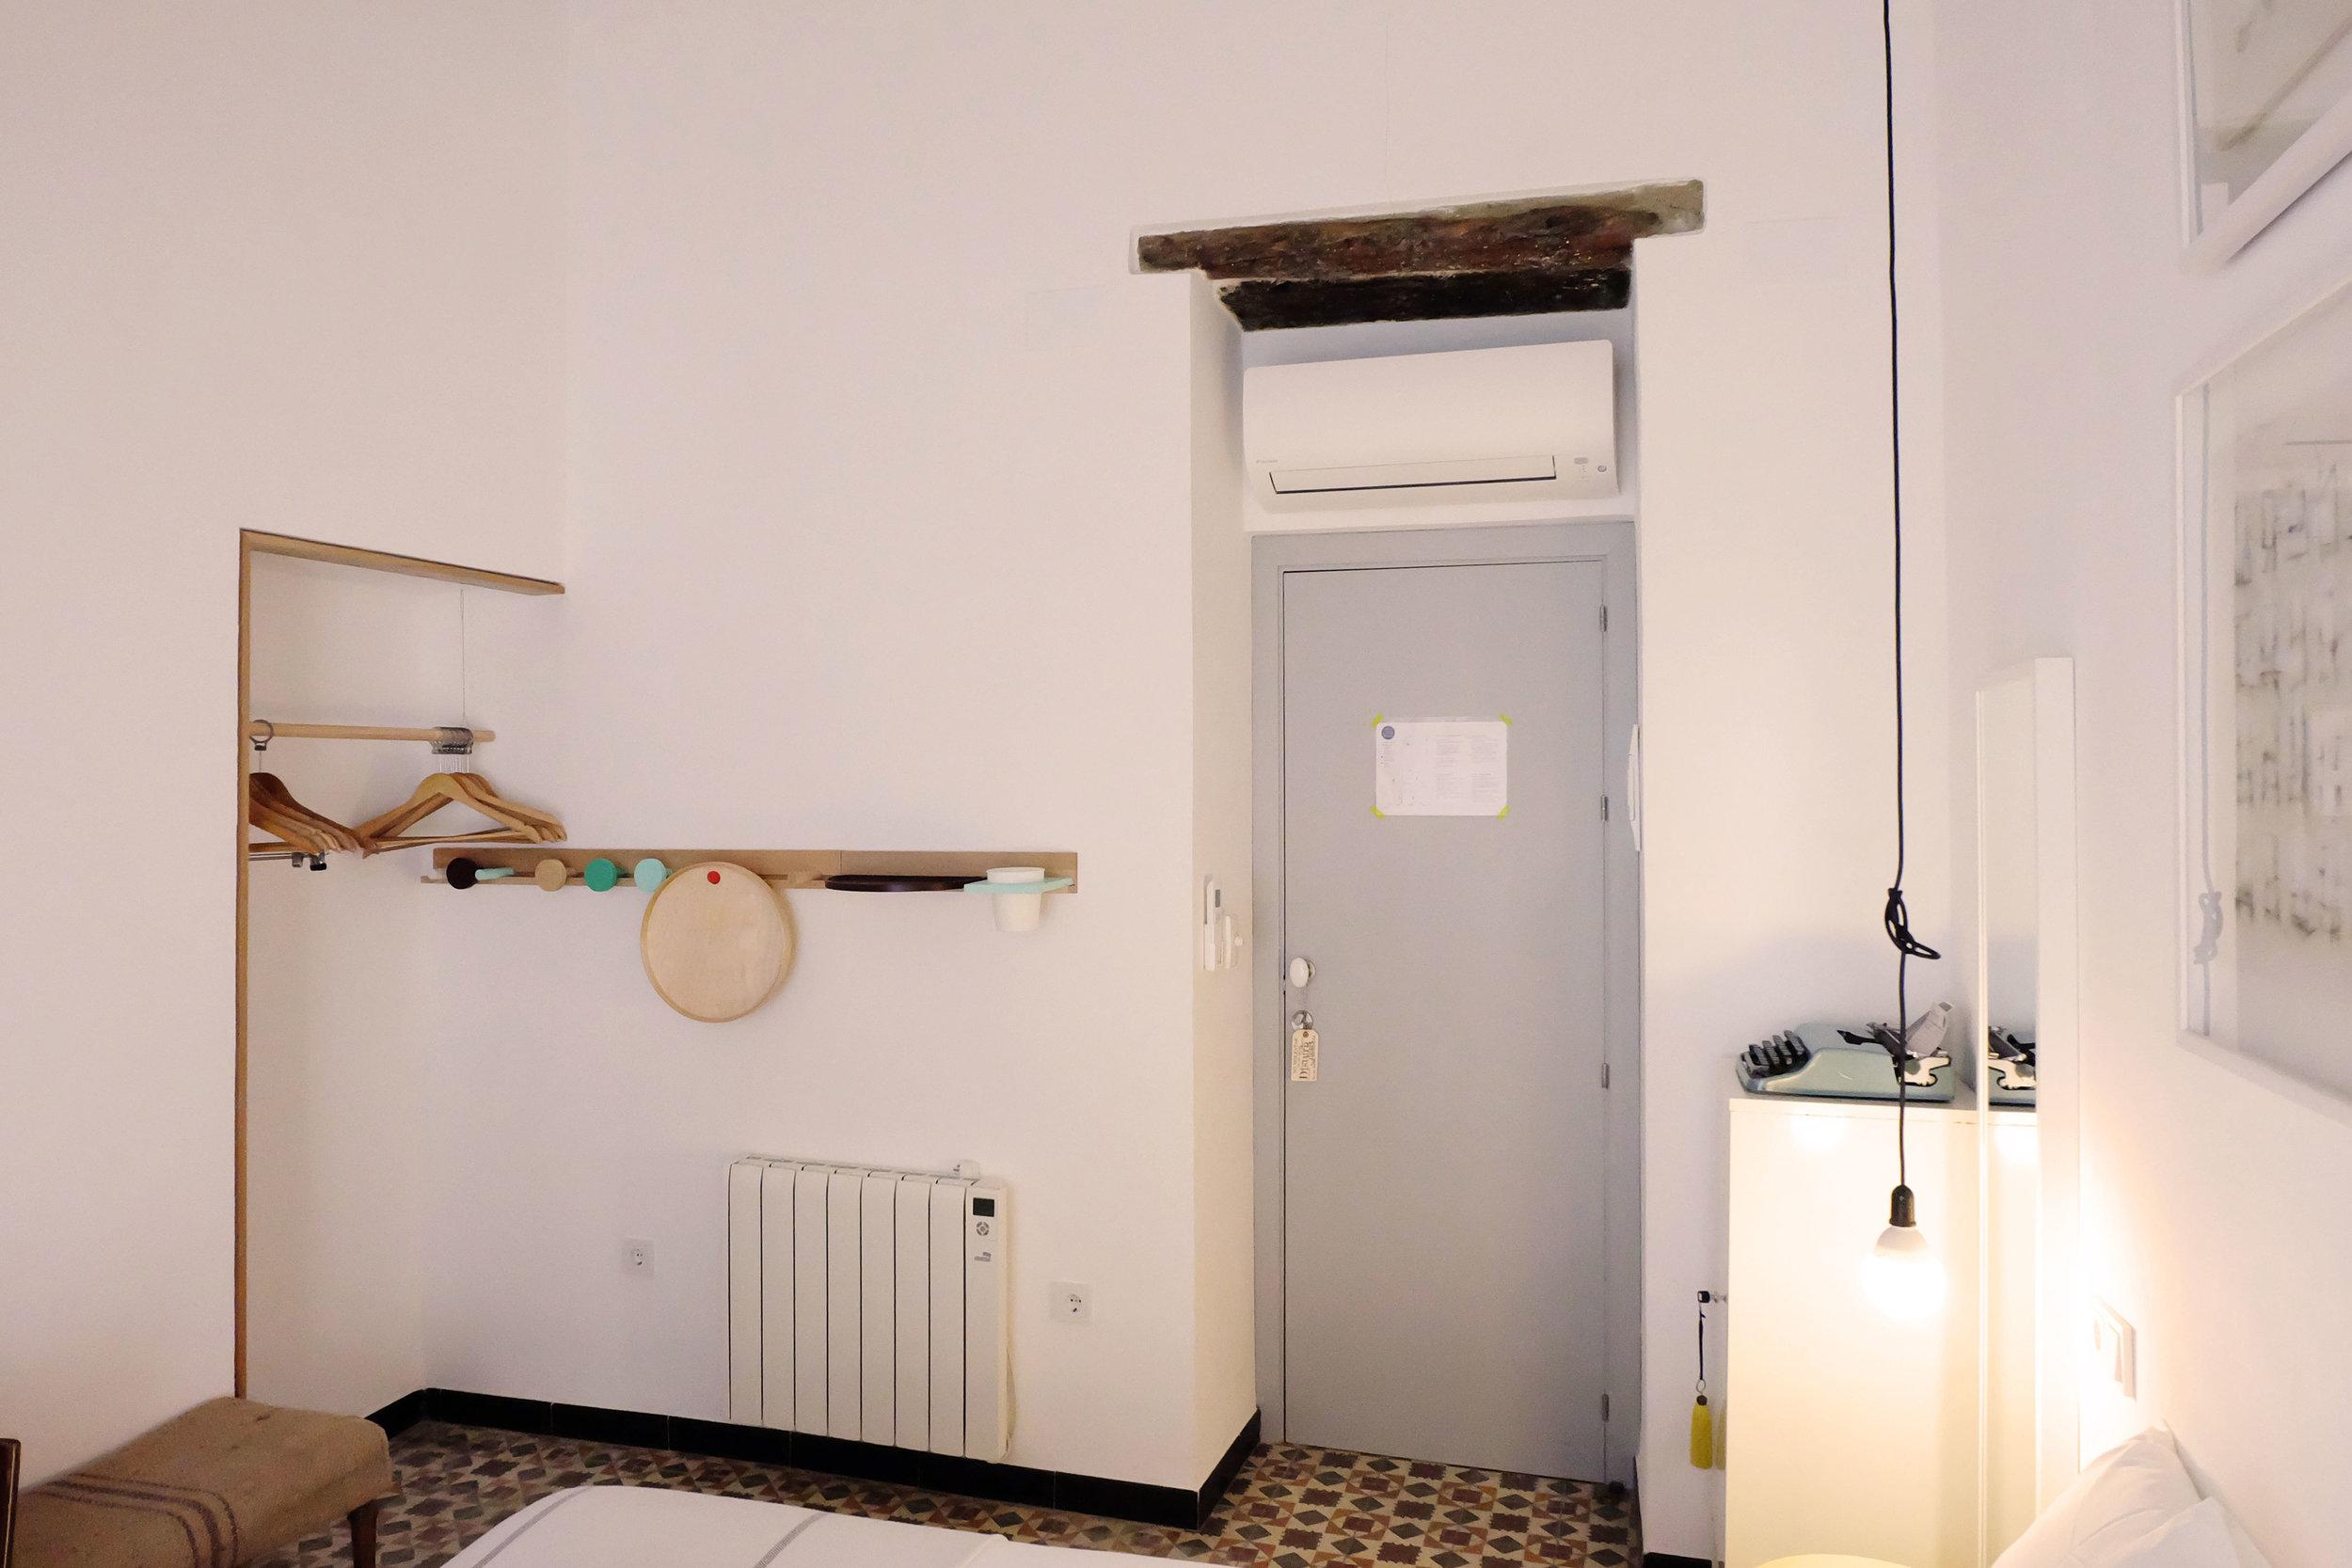 Hotel-Casa-de-huespedes-santa-maria-Habitacion-8-6.JPG